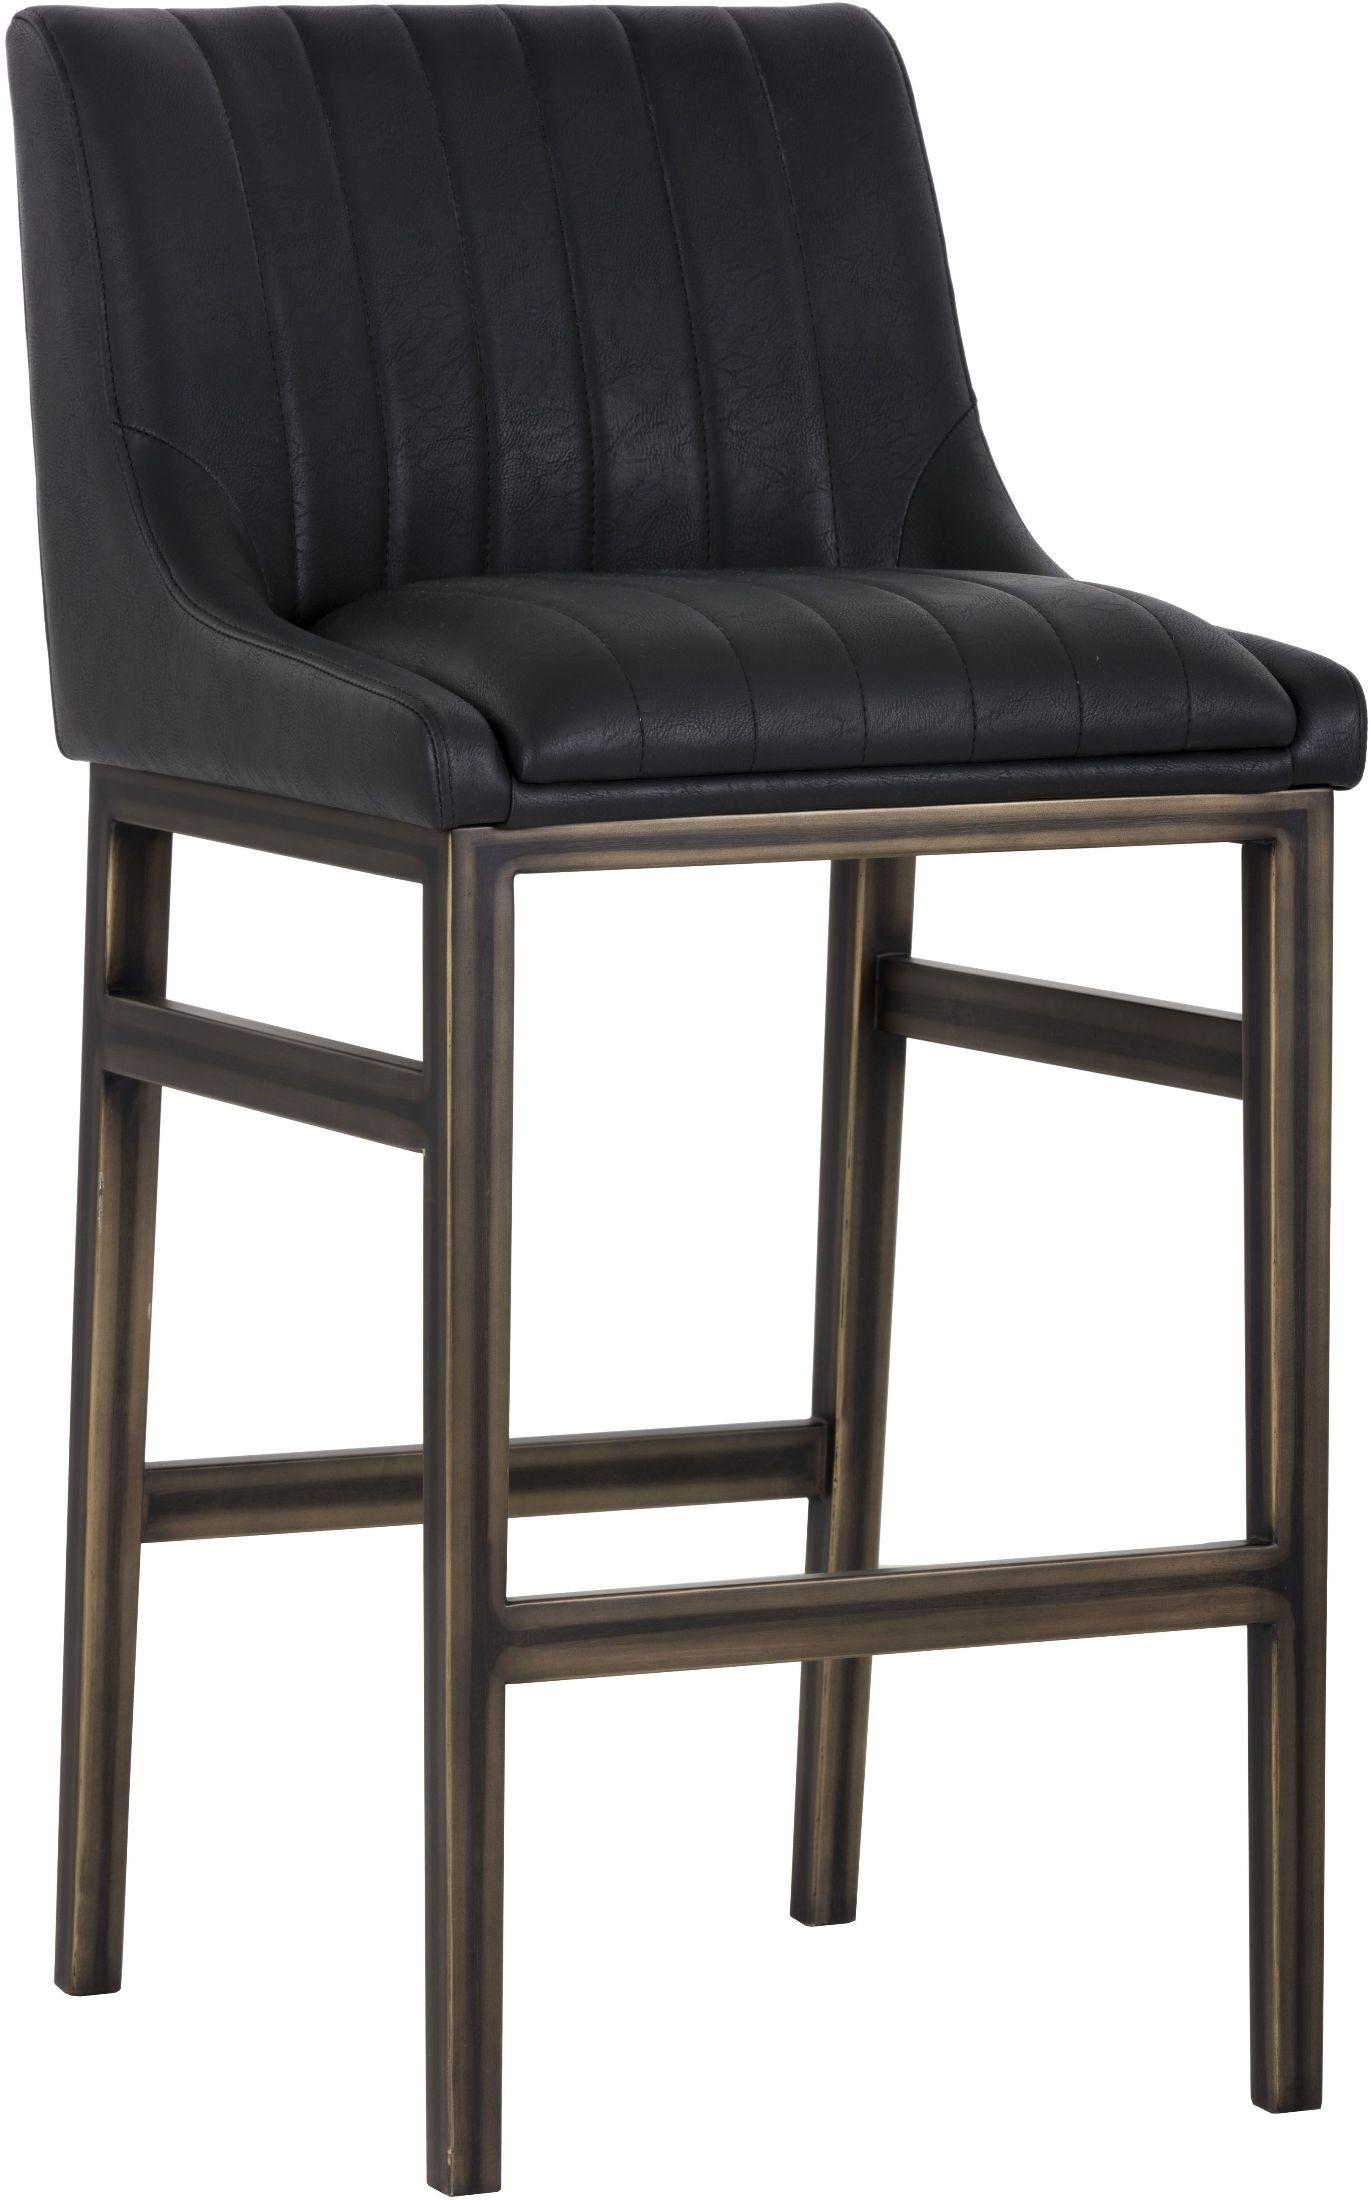 Halden Vintage Black Armless Barstool 101743 Sunpan